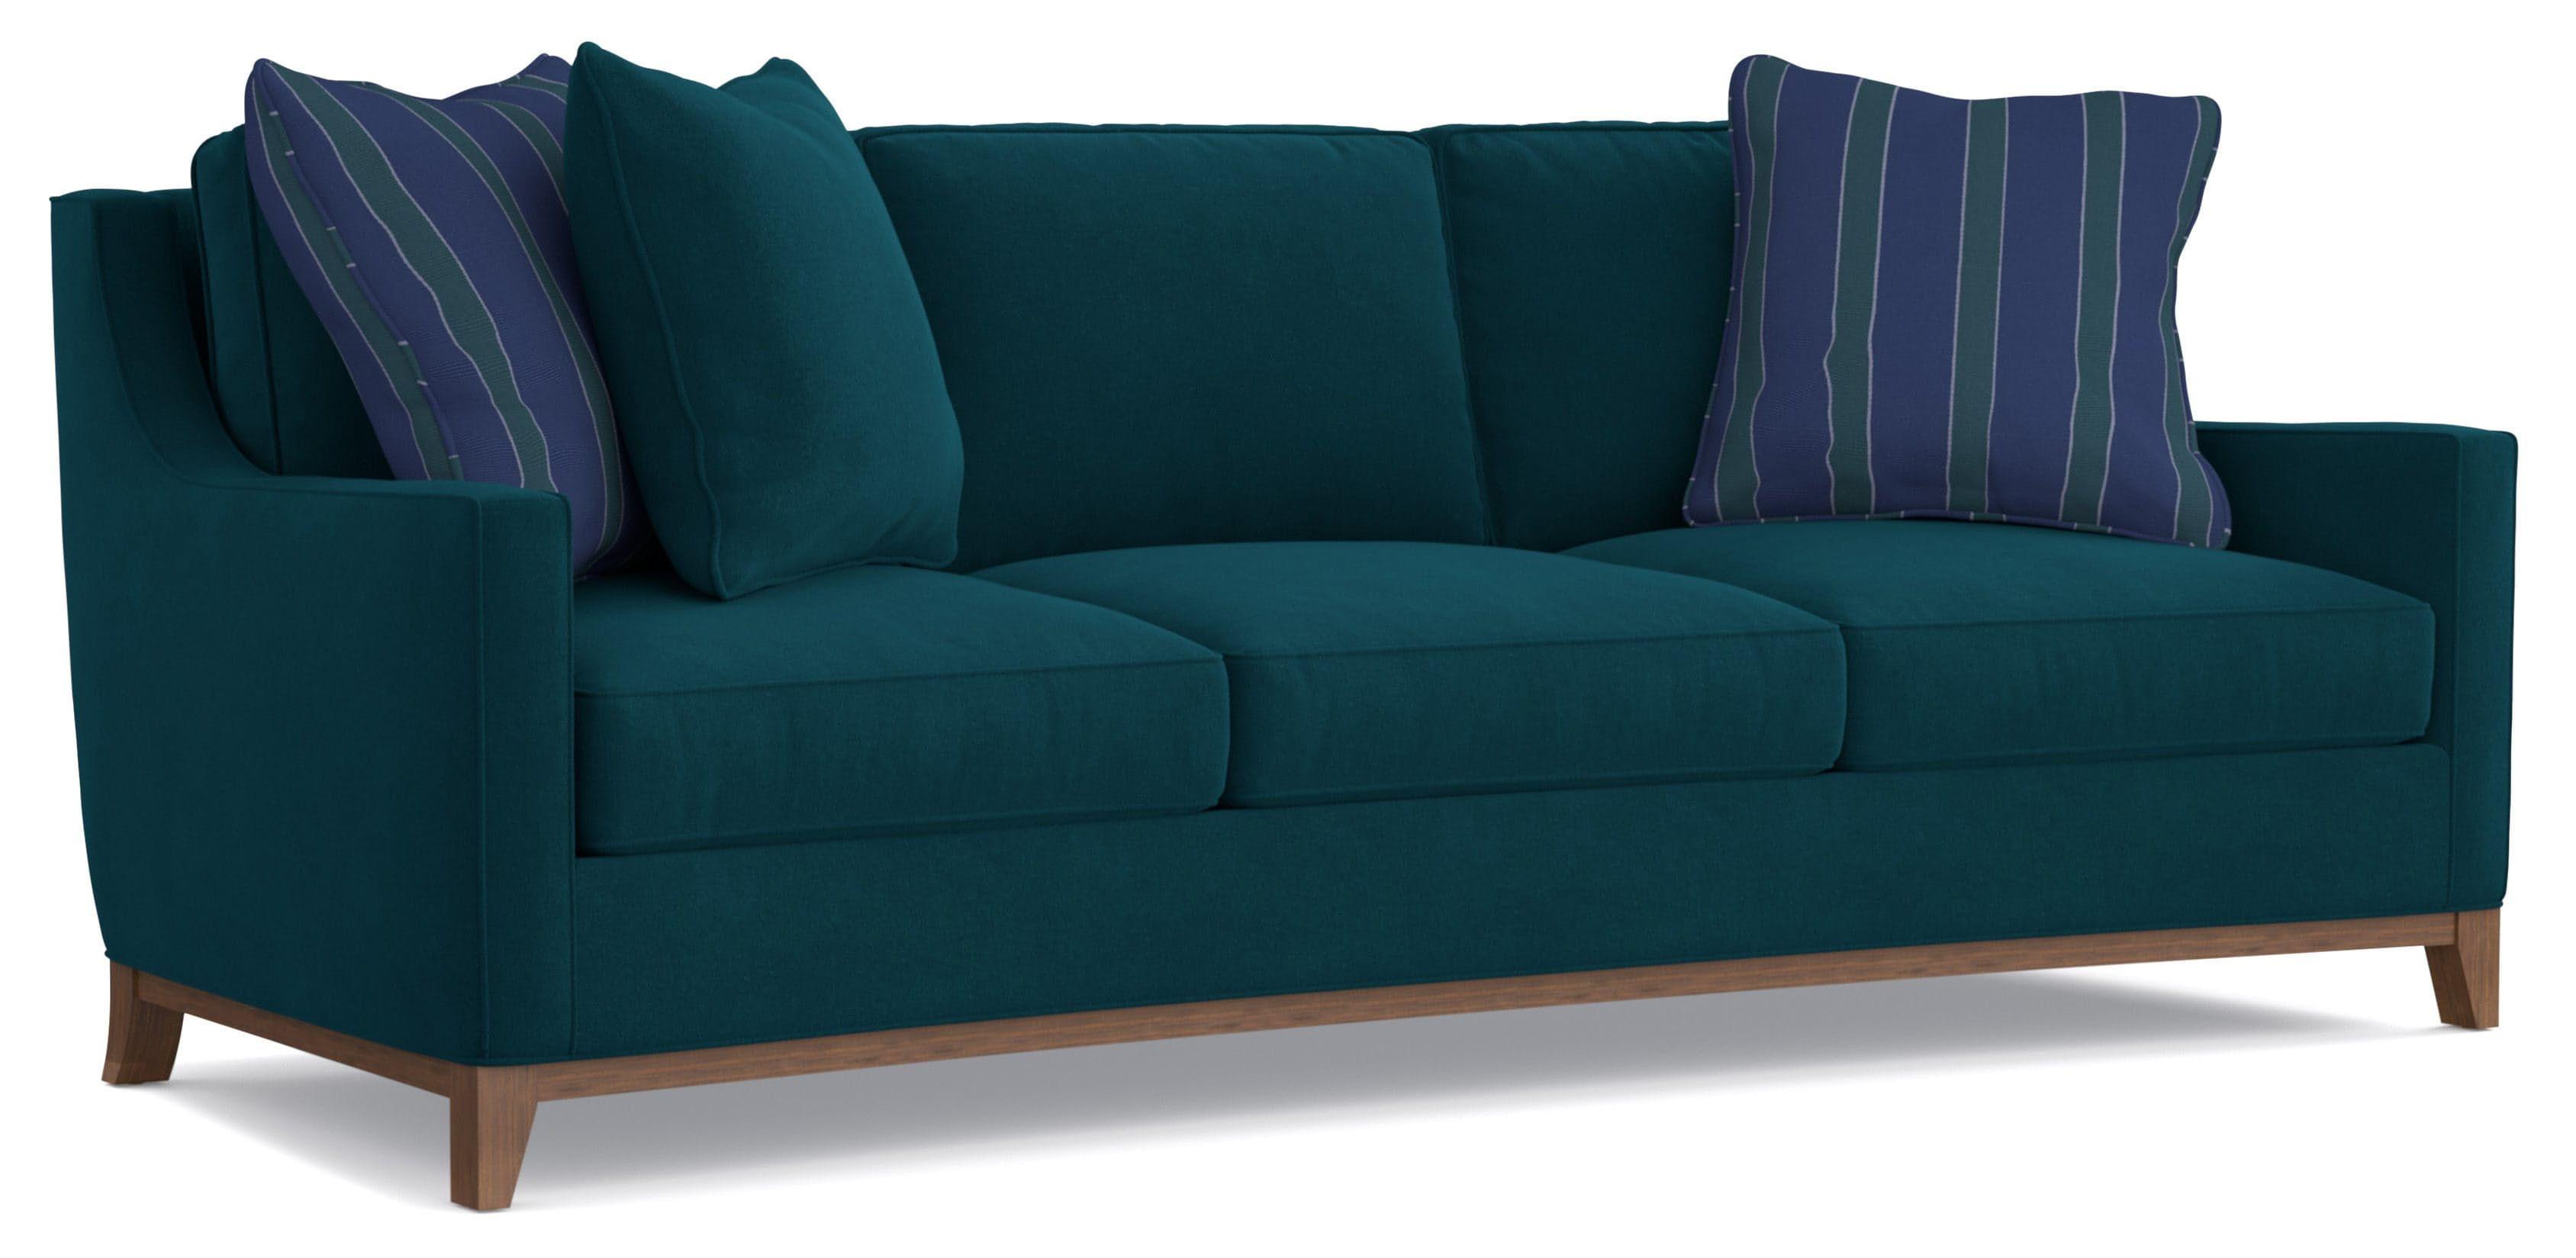 Cynthia Rowley For Furniture Hamptons 3 Over Sofa 7072 002cr